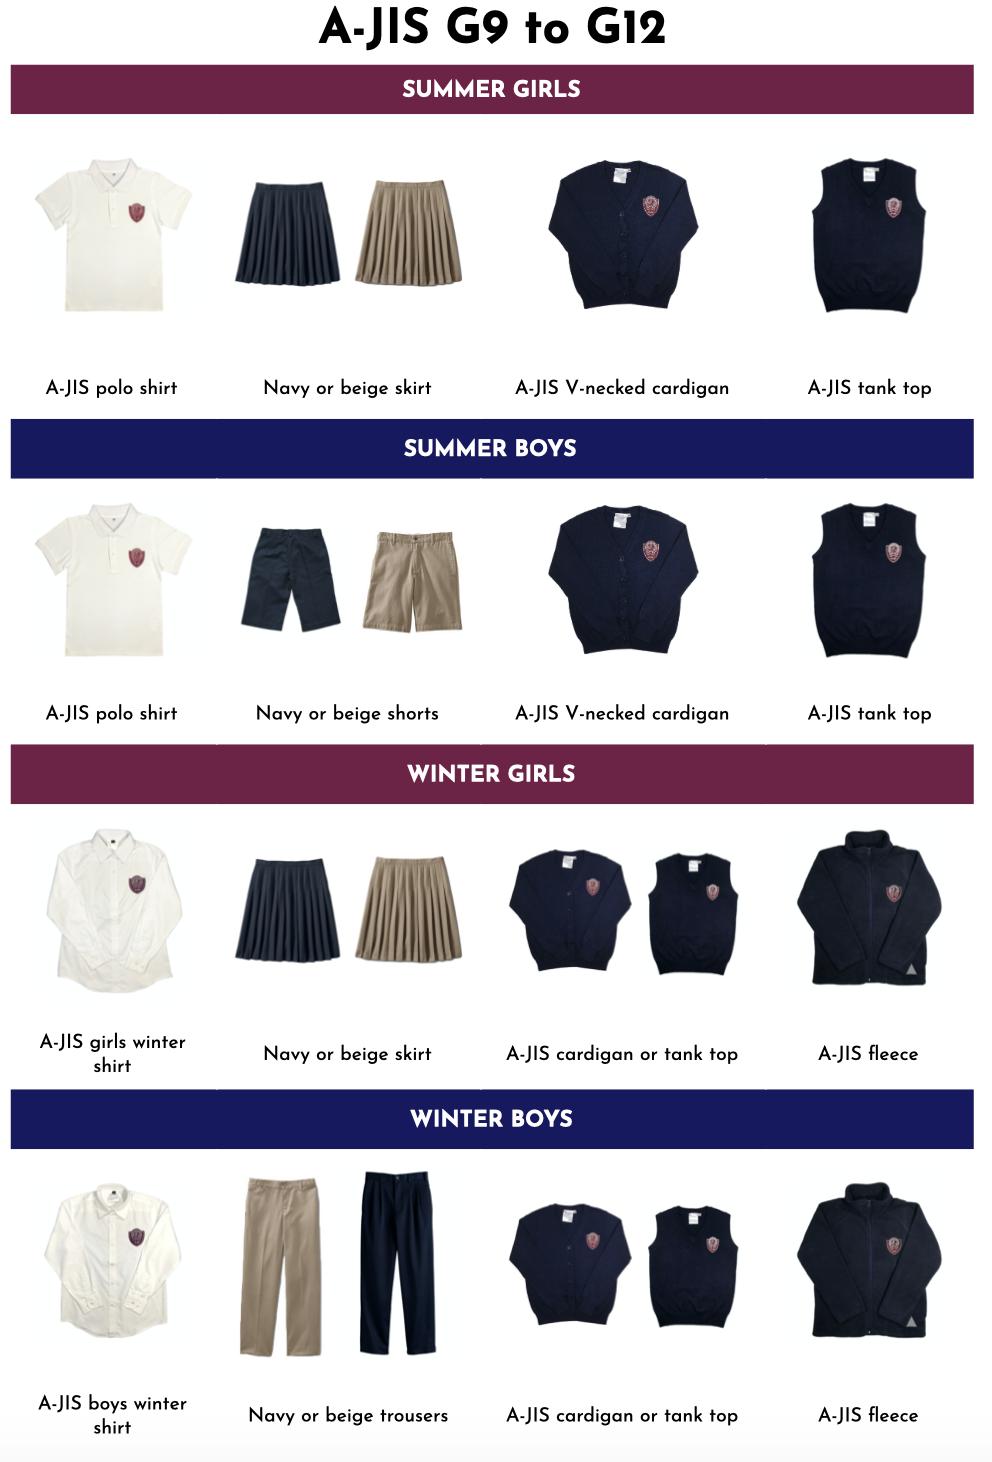 ajis-uniform-guide-2020-7.png